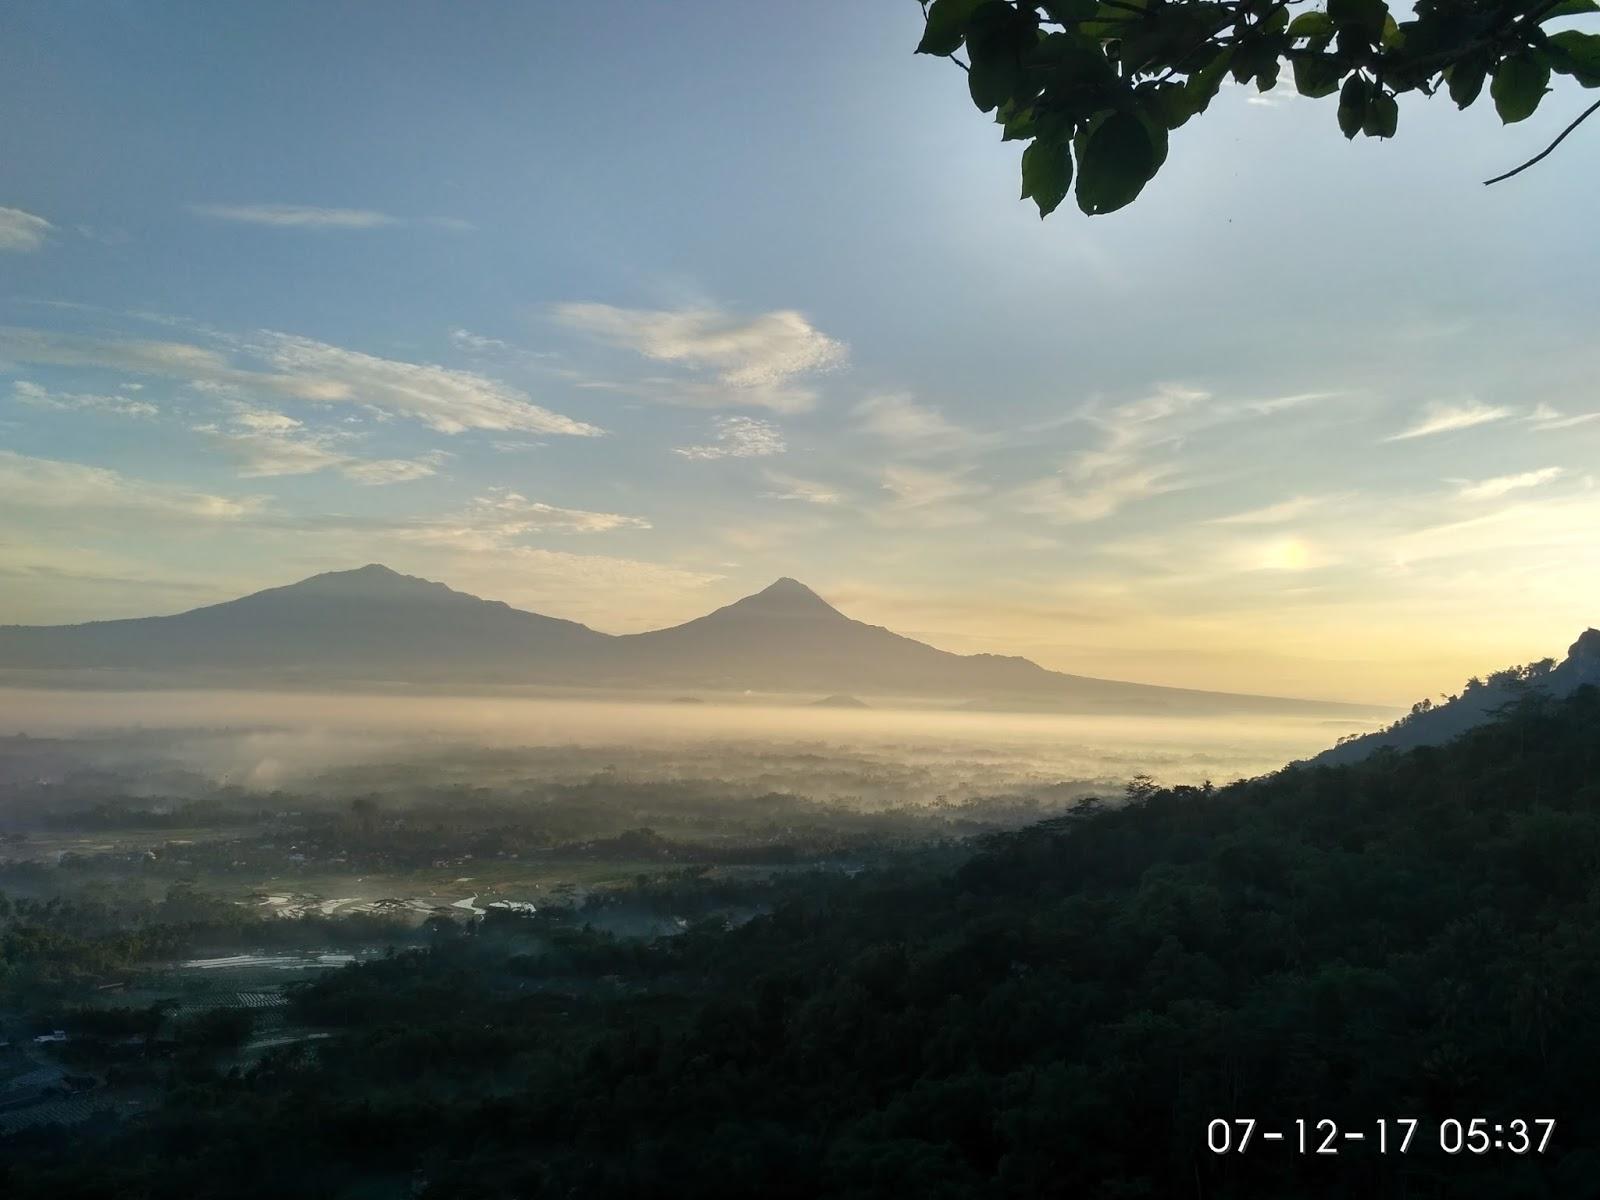 Mengejar Sunrise Punthuk Gupakan Traveling Diary Spot Foto Disana Photo